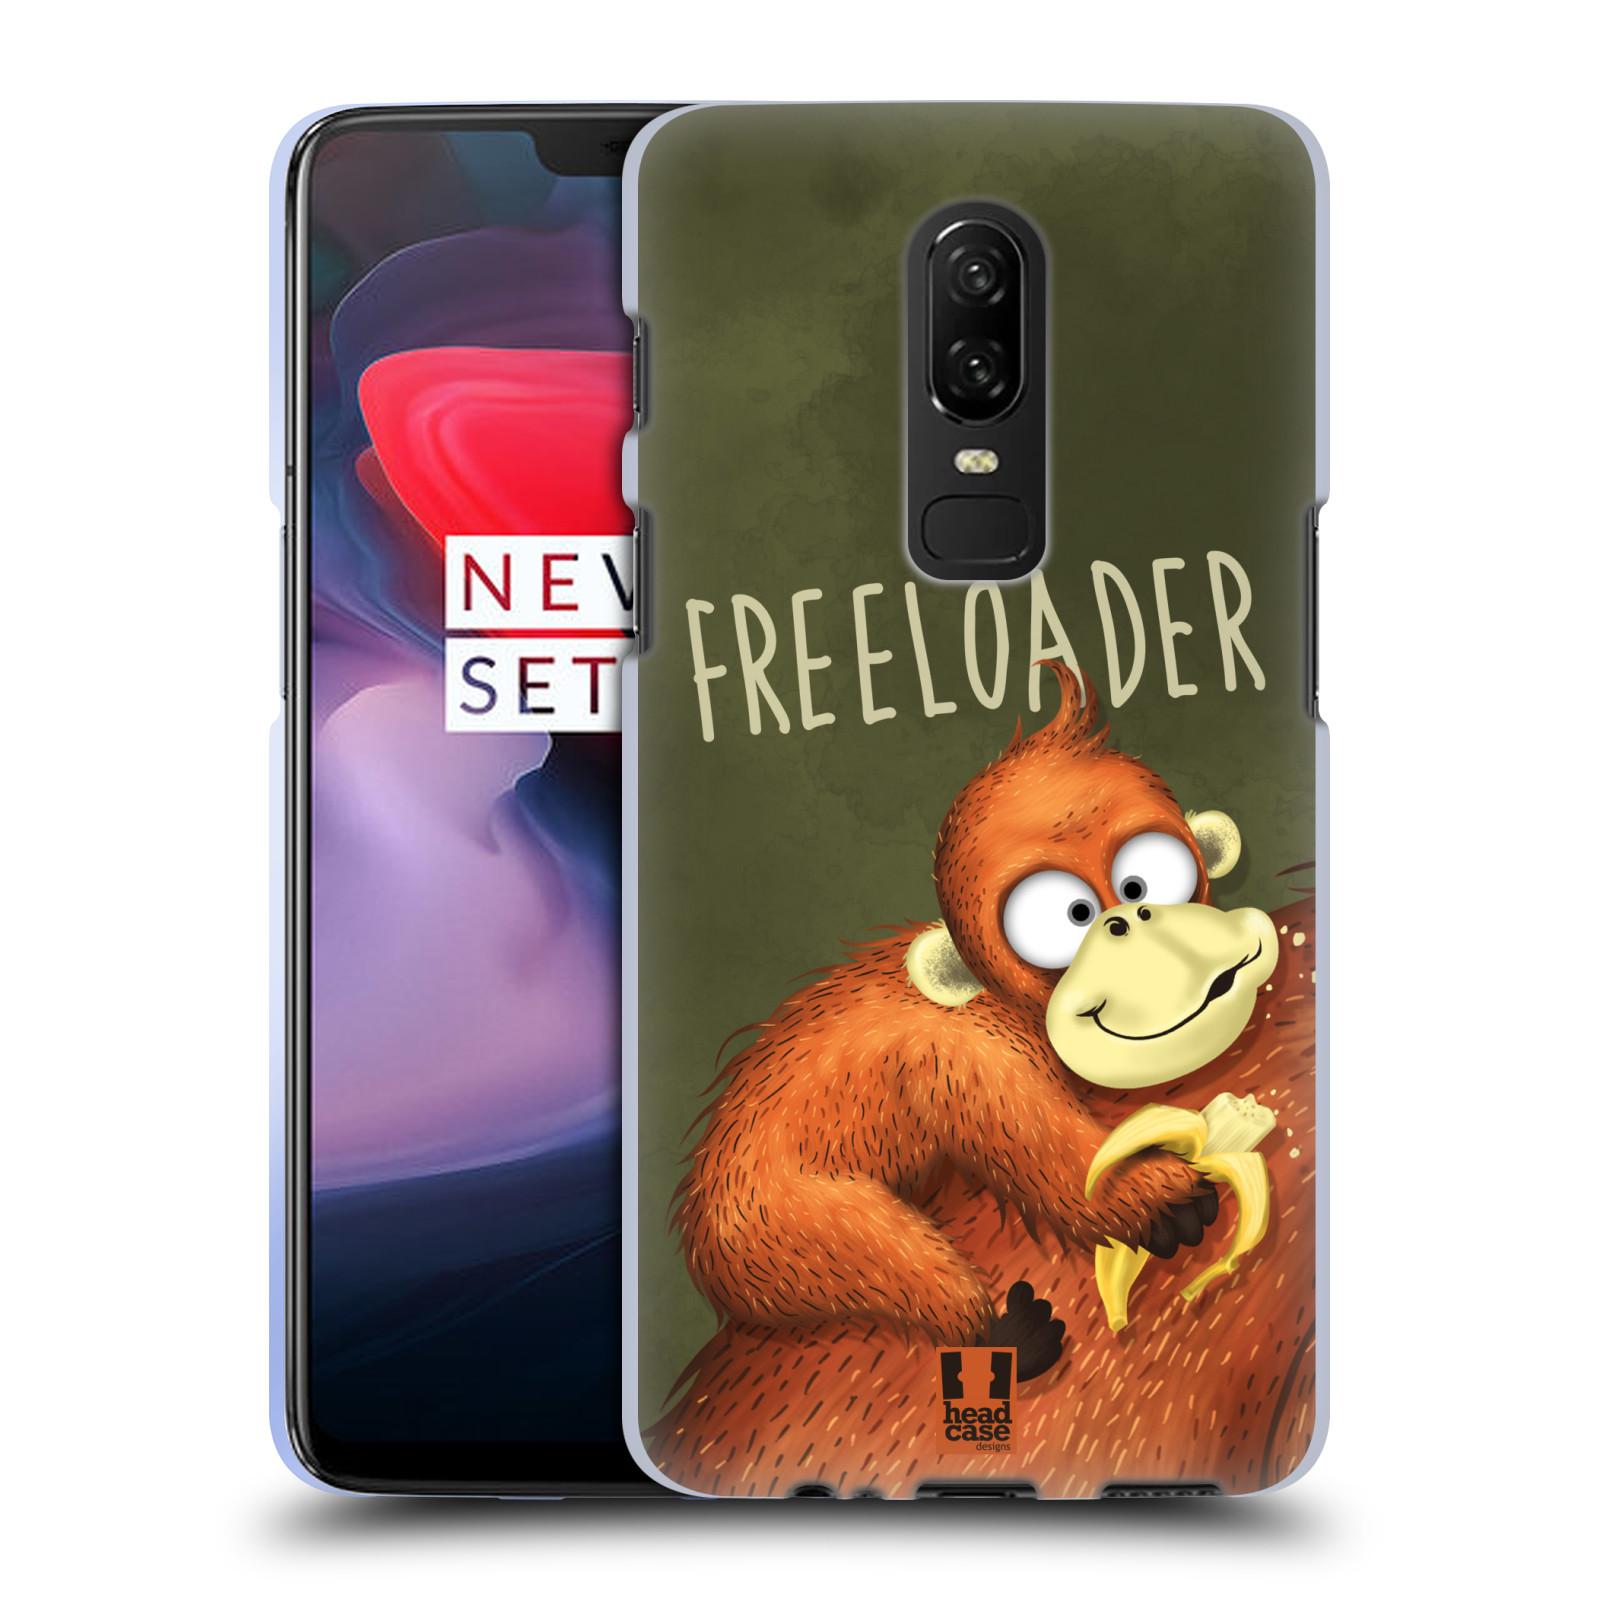 Silikonové pouzdro na mobil OnePlus 6 - Head Case - Opičák Freeloader